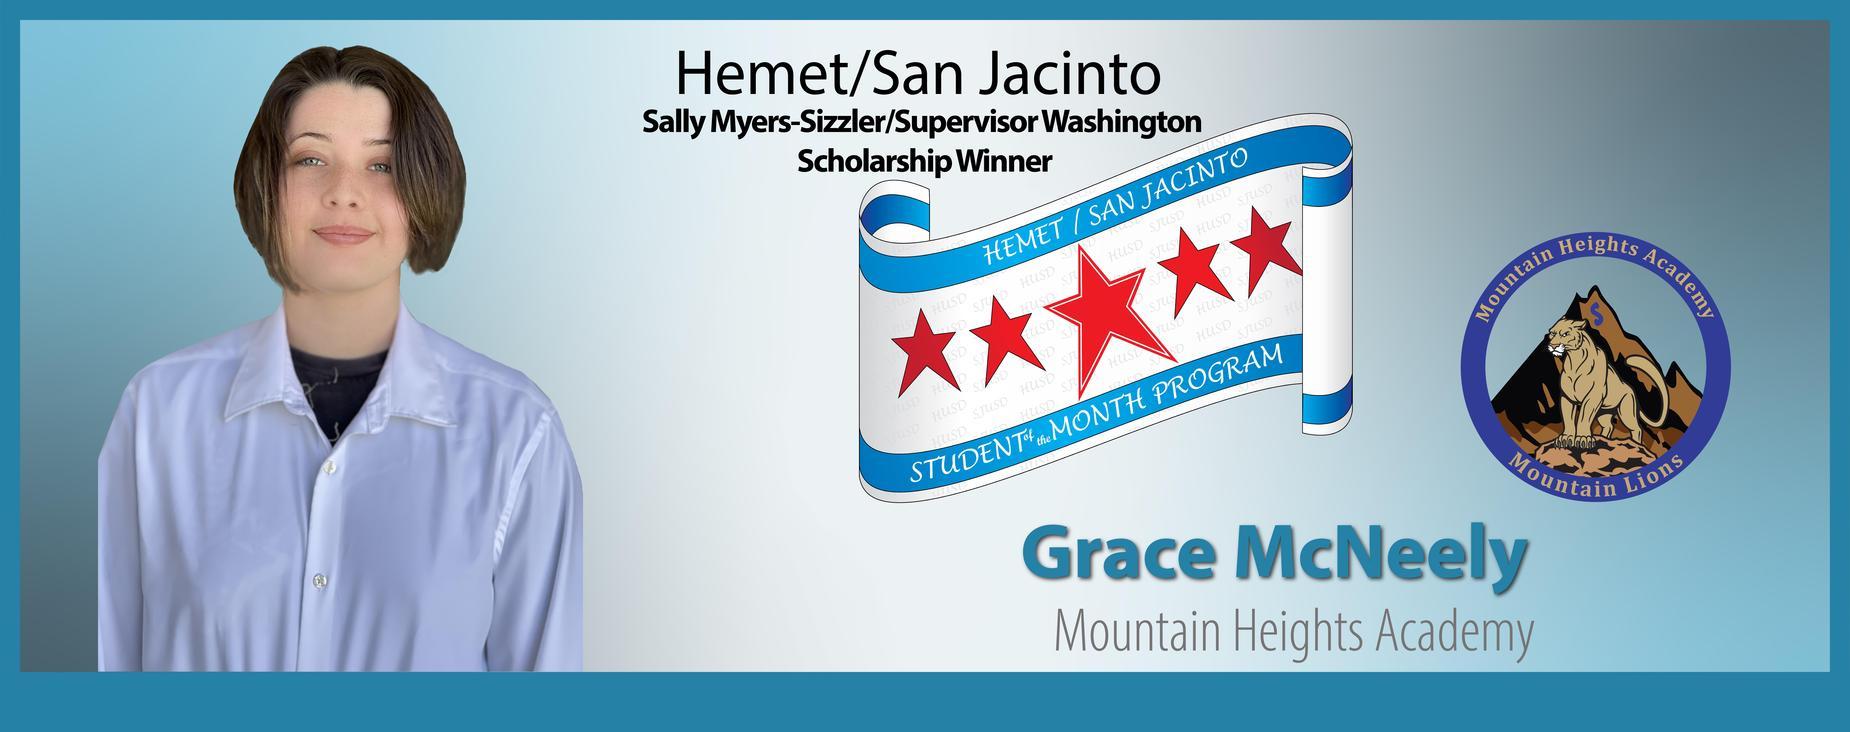 Grace McNeely Scholarship Winner